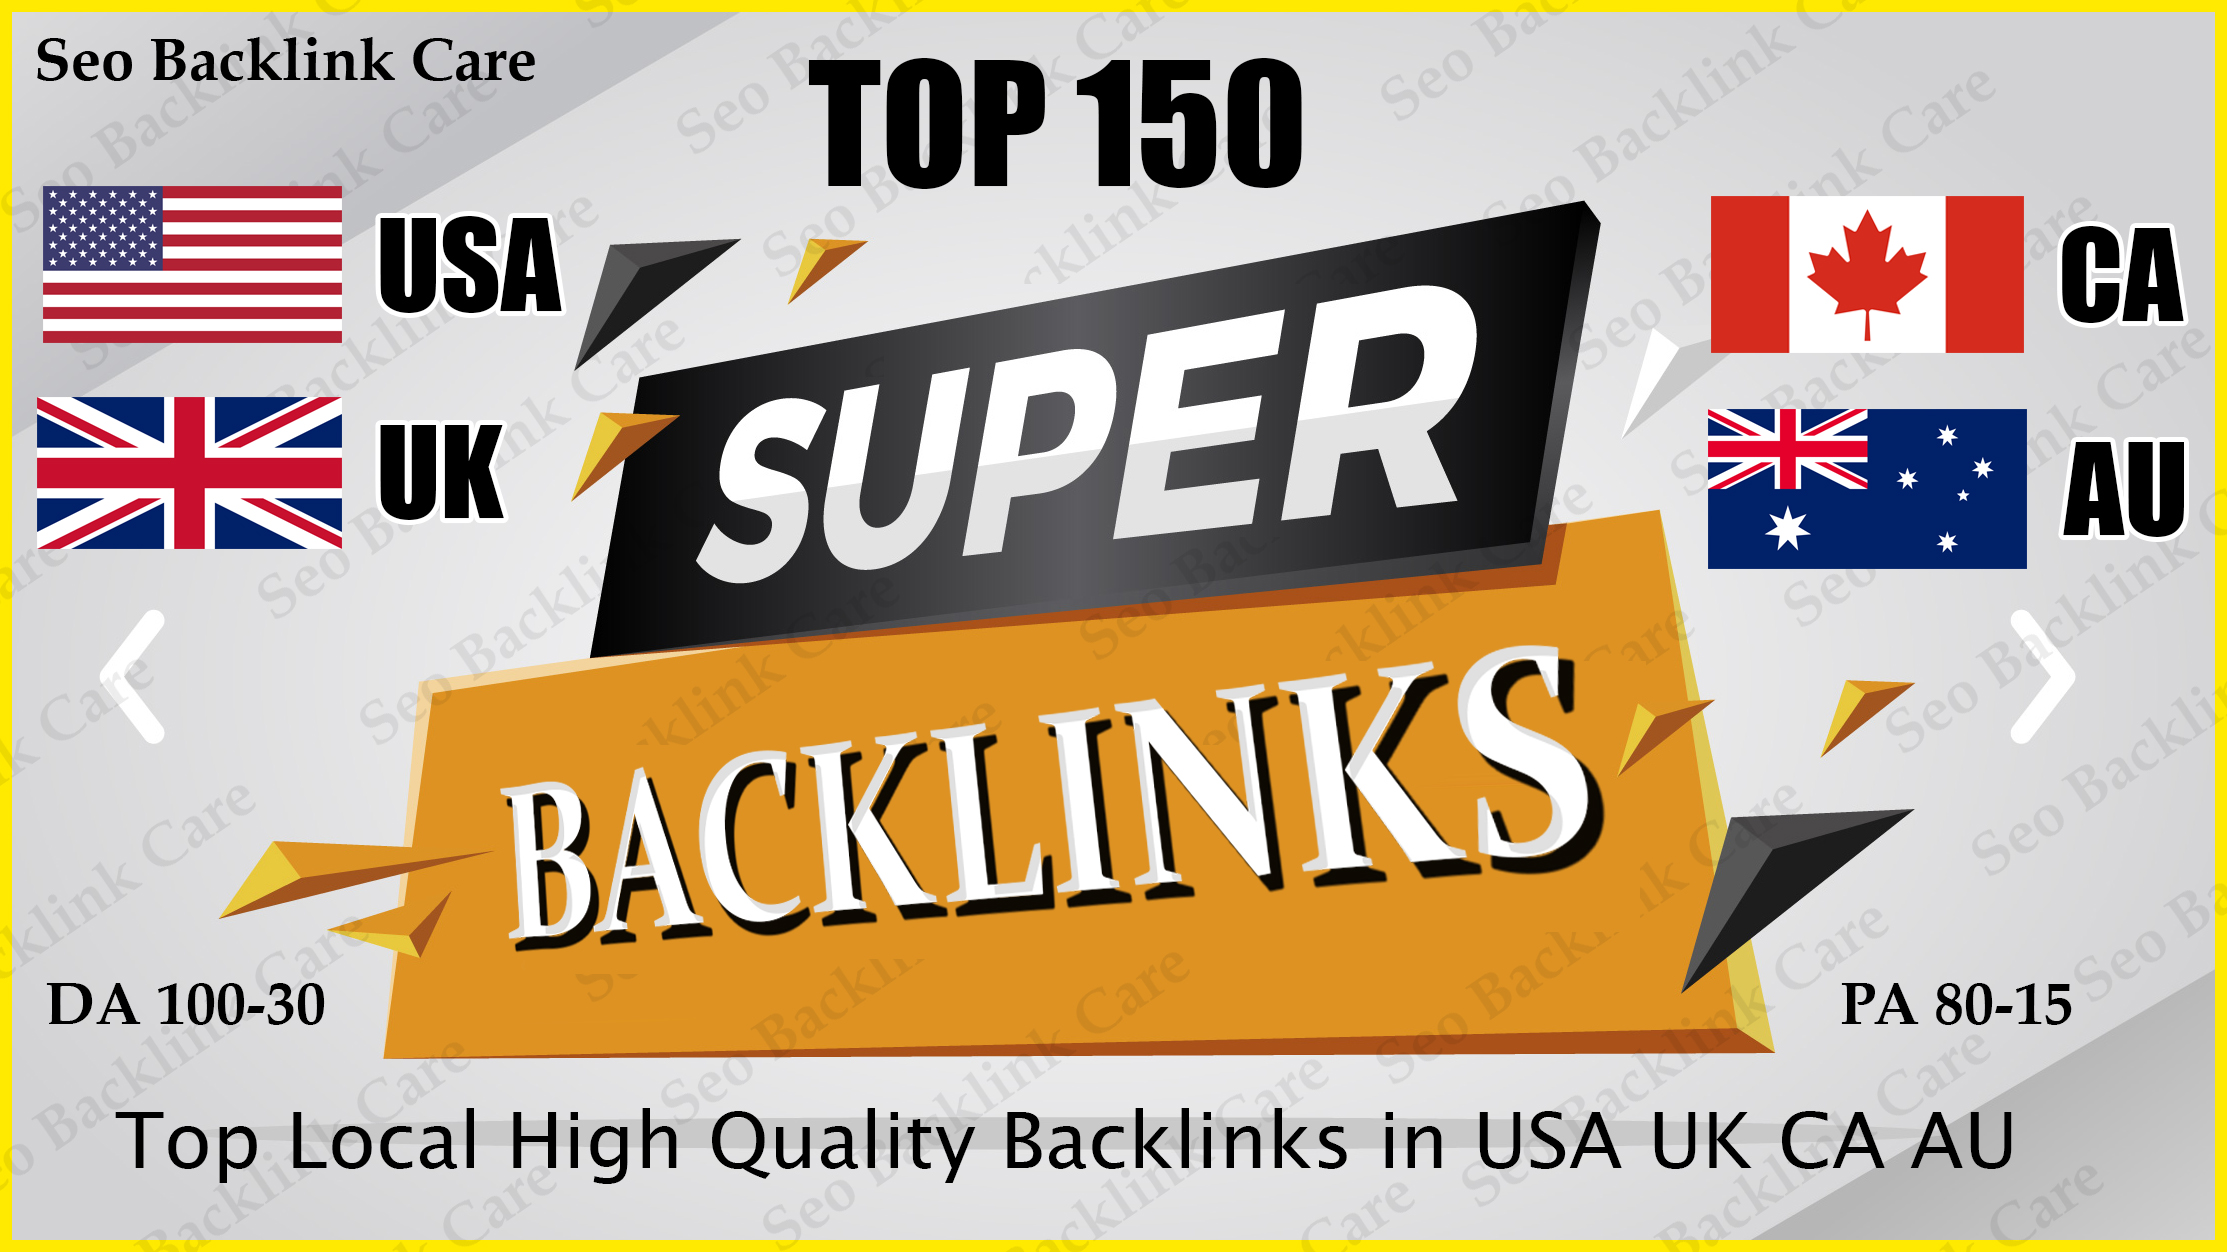 I do Top 20-150 USA UK CA AU Local Backlink SEO HQ Link Building Services for Google Ranking